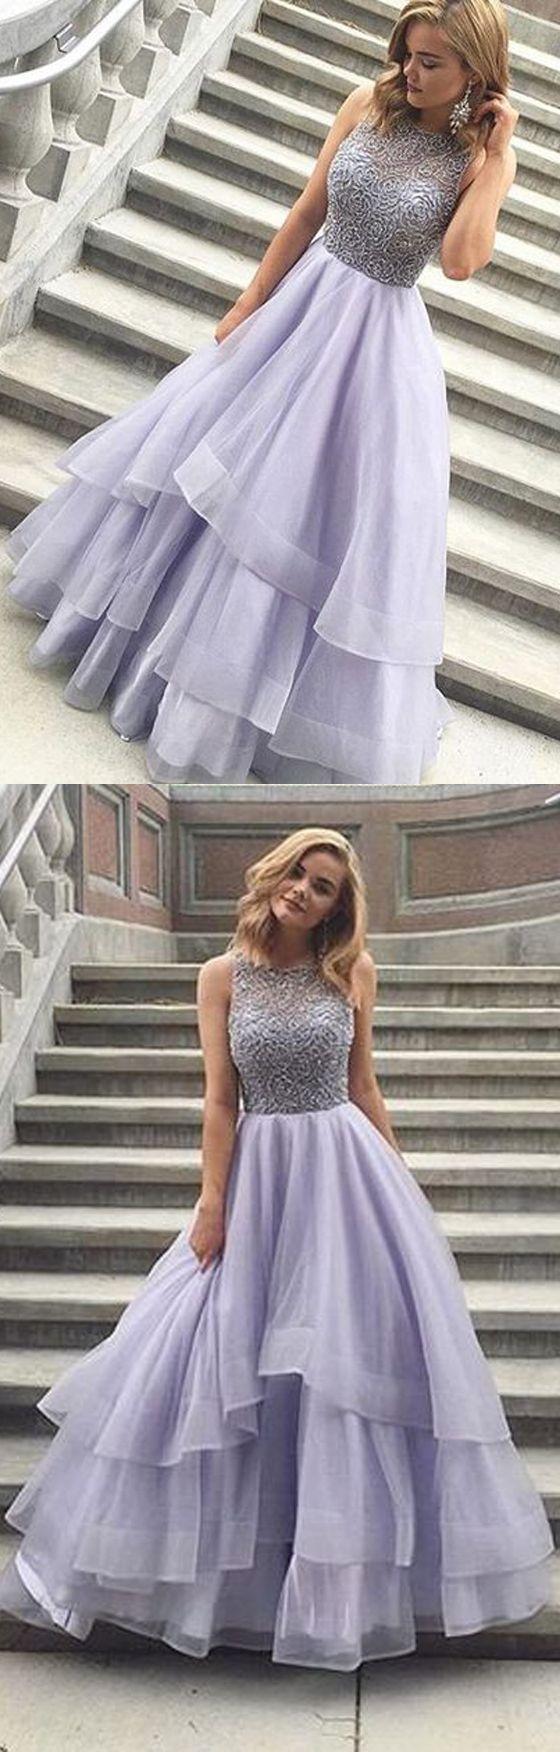 Robe de bal cute ucucucuc dressess pinterest inexpensive prom